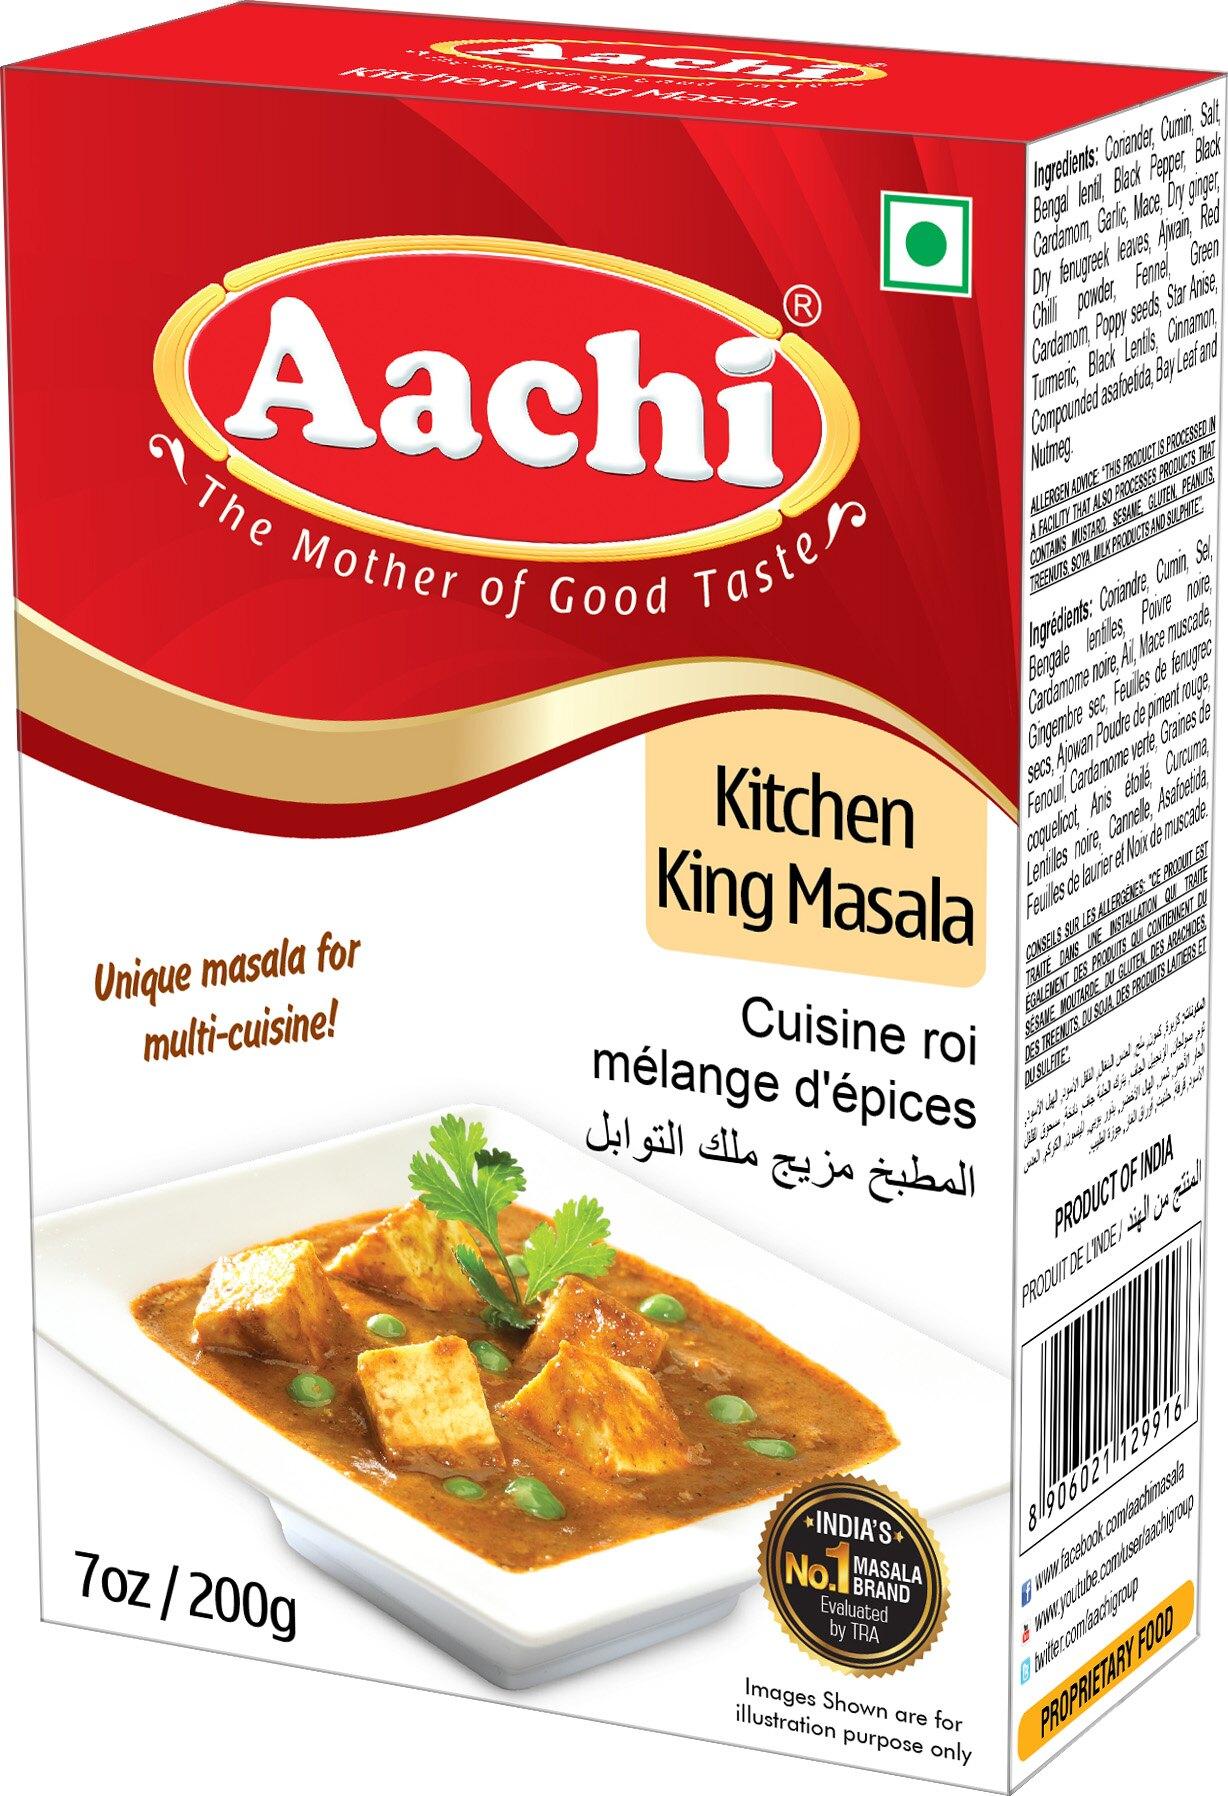 廚王咖哩粉   Kitchen King Masala AACHI 200gm